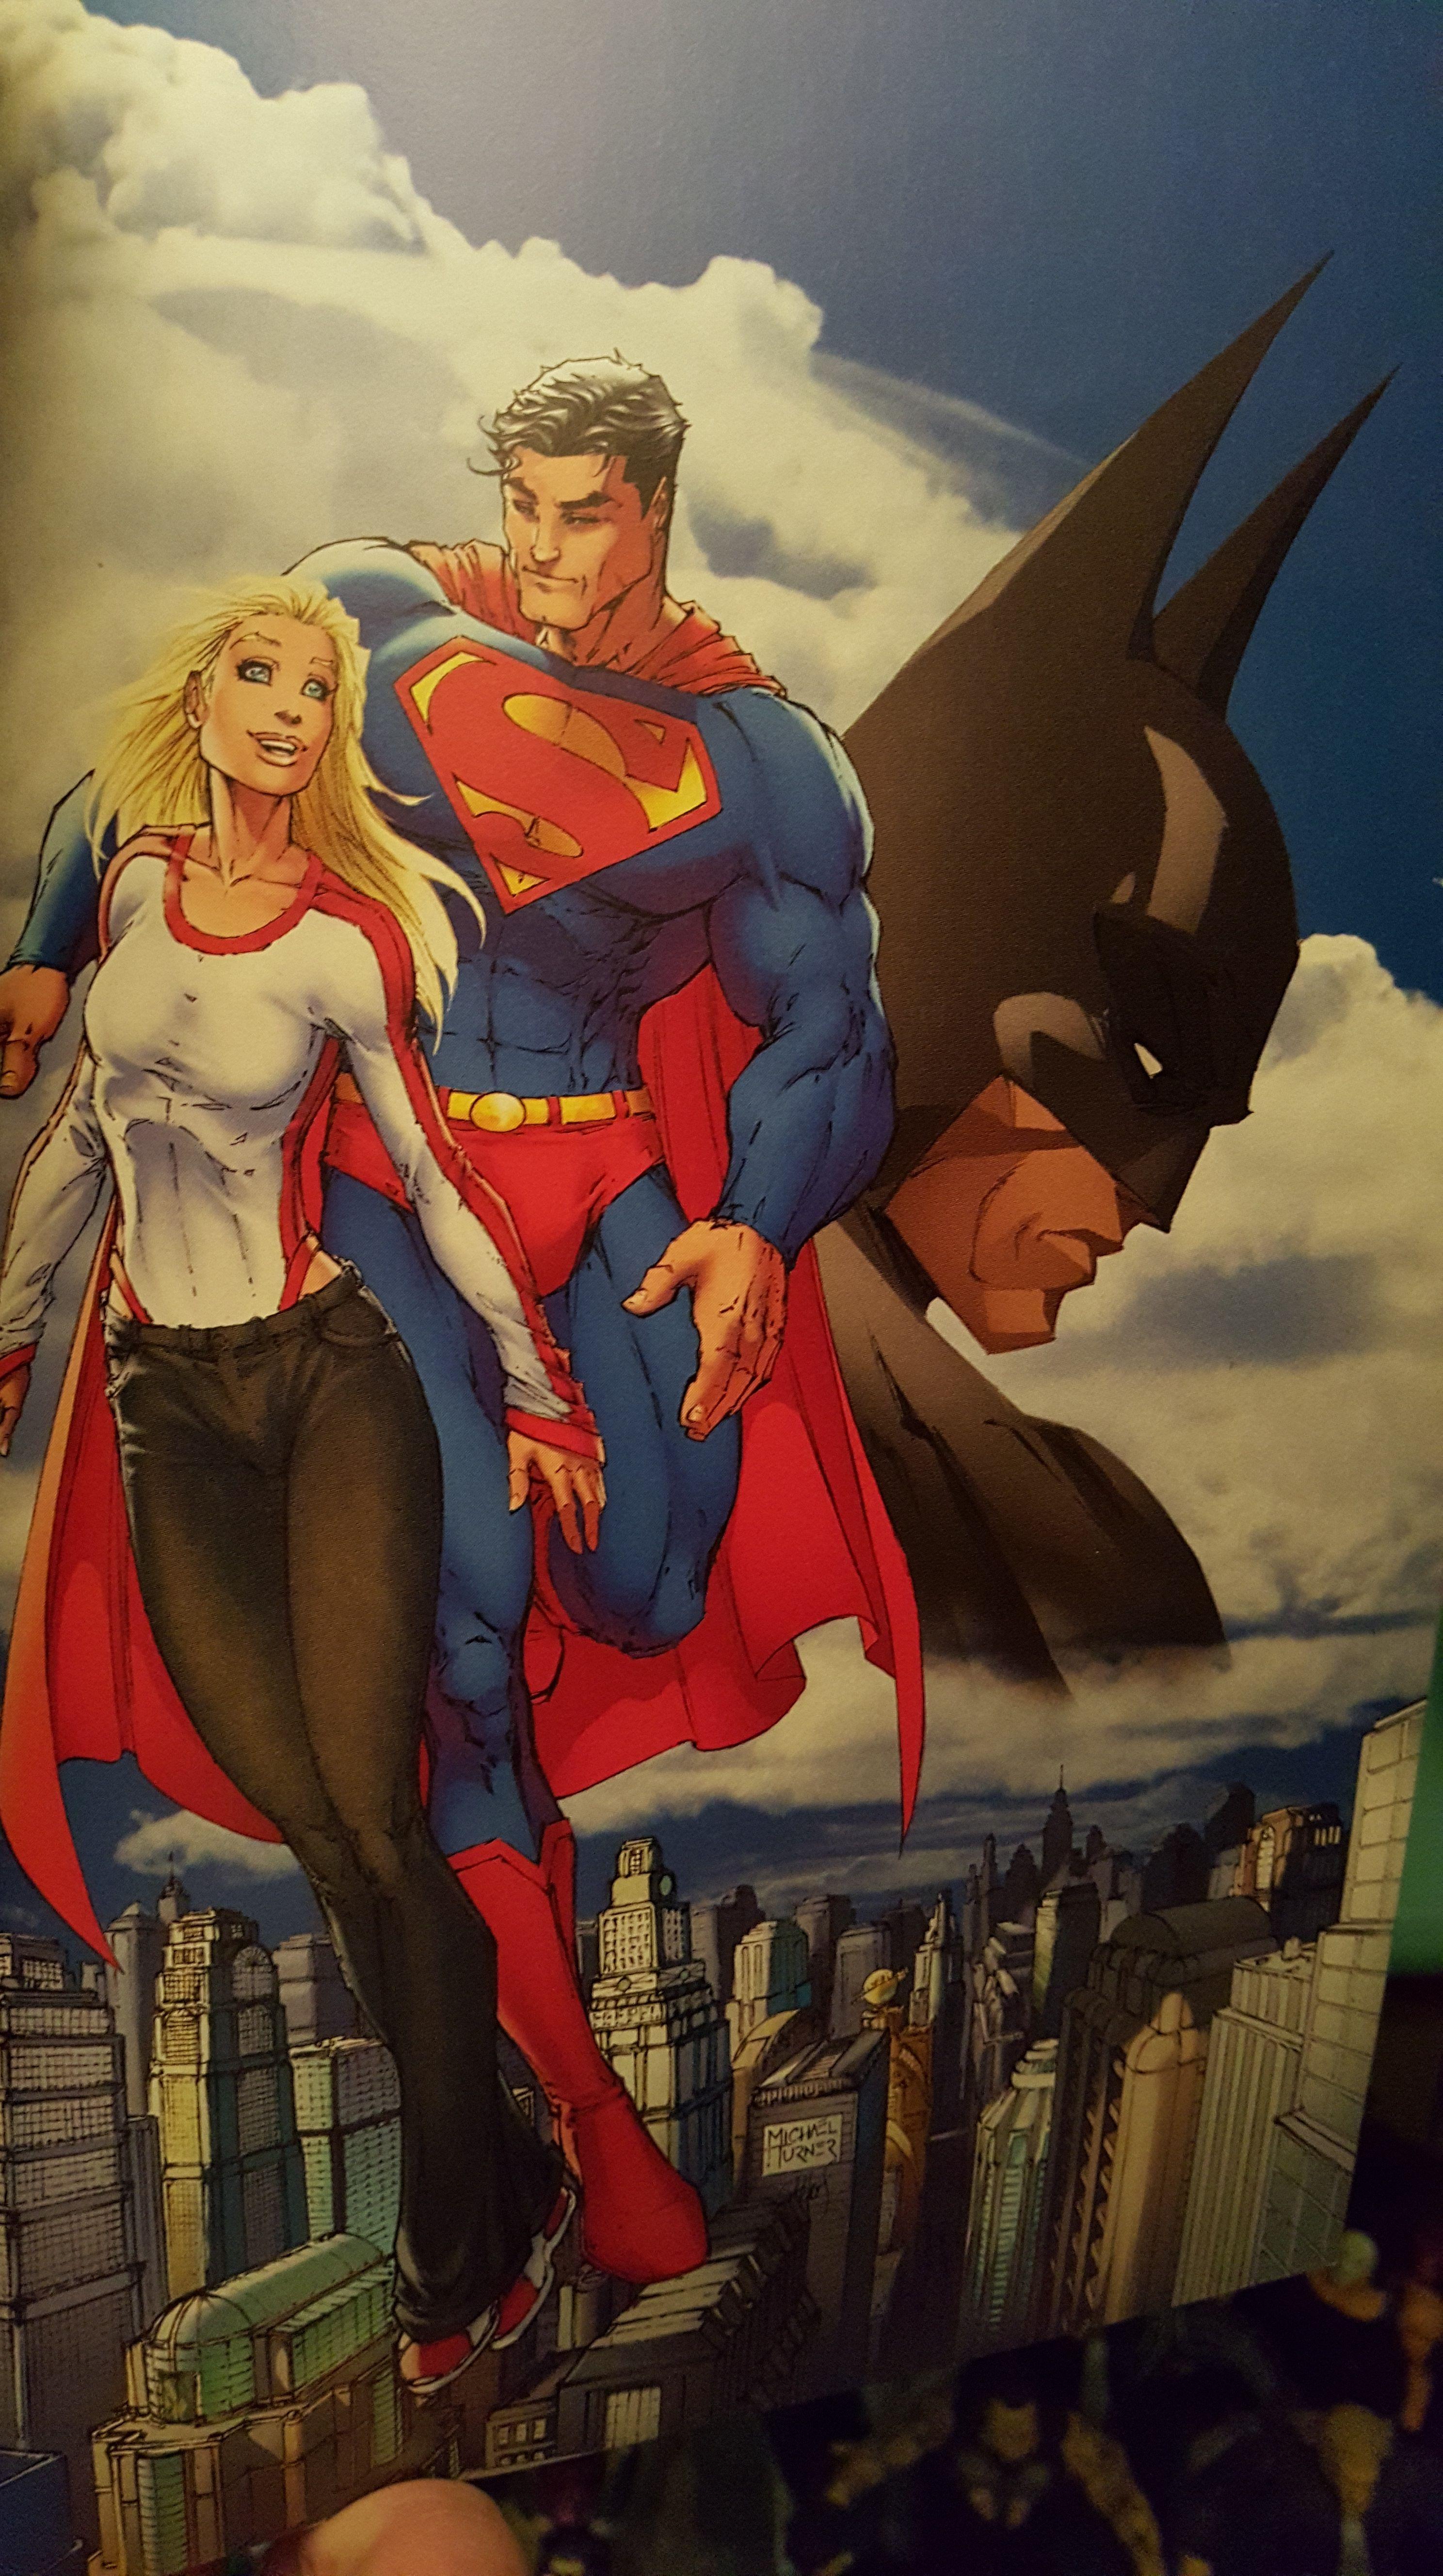 Tbtreviews Superman Batman Apocalypse Or The Reintroduction Of Supergirl Superman Batman Apocalypse Supergirl Supergirl Superman